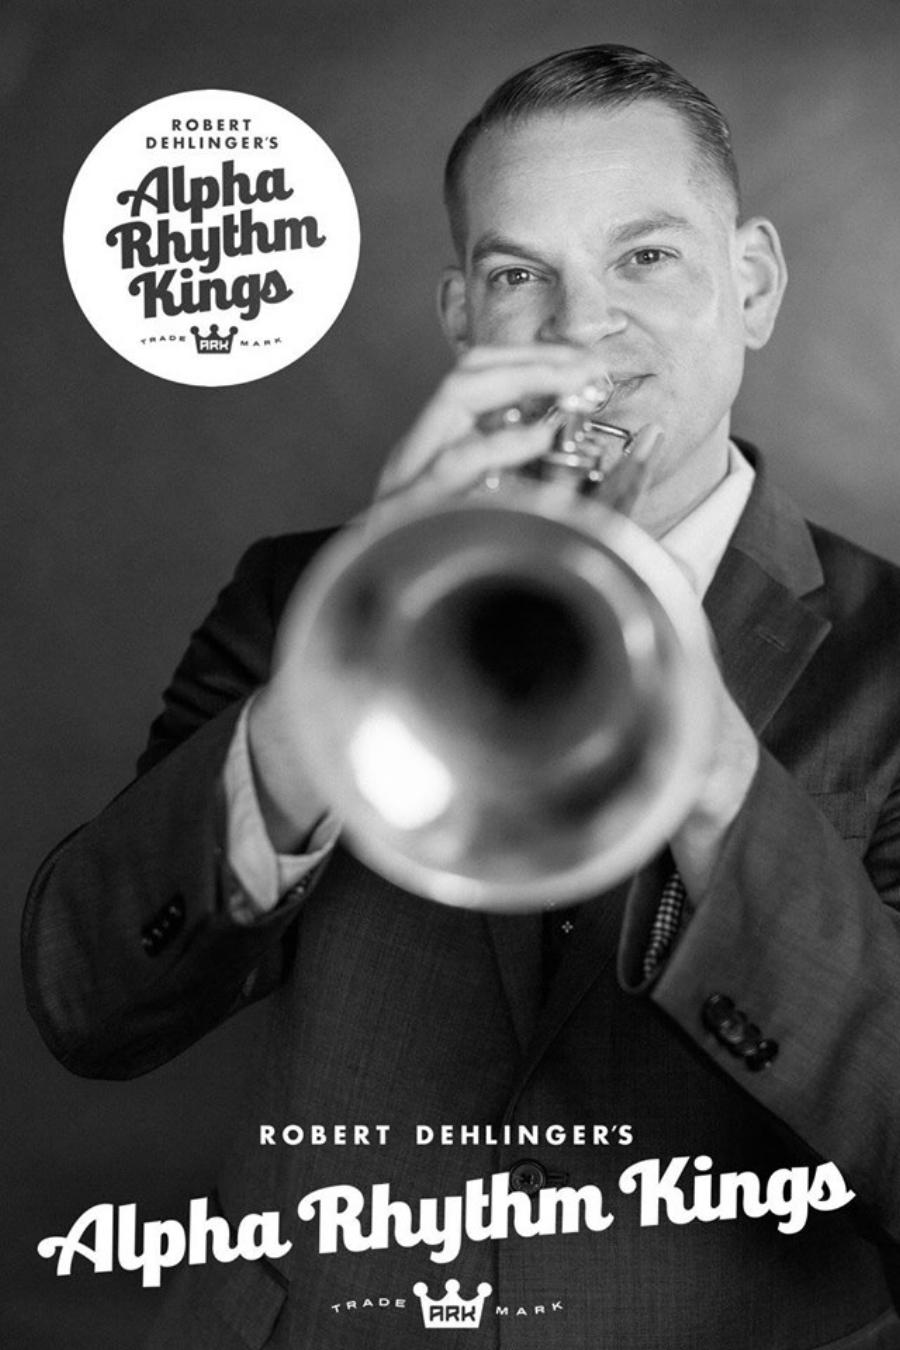 Alpha Rhythm Kings photo 1.jpg